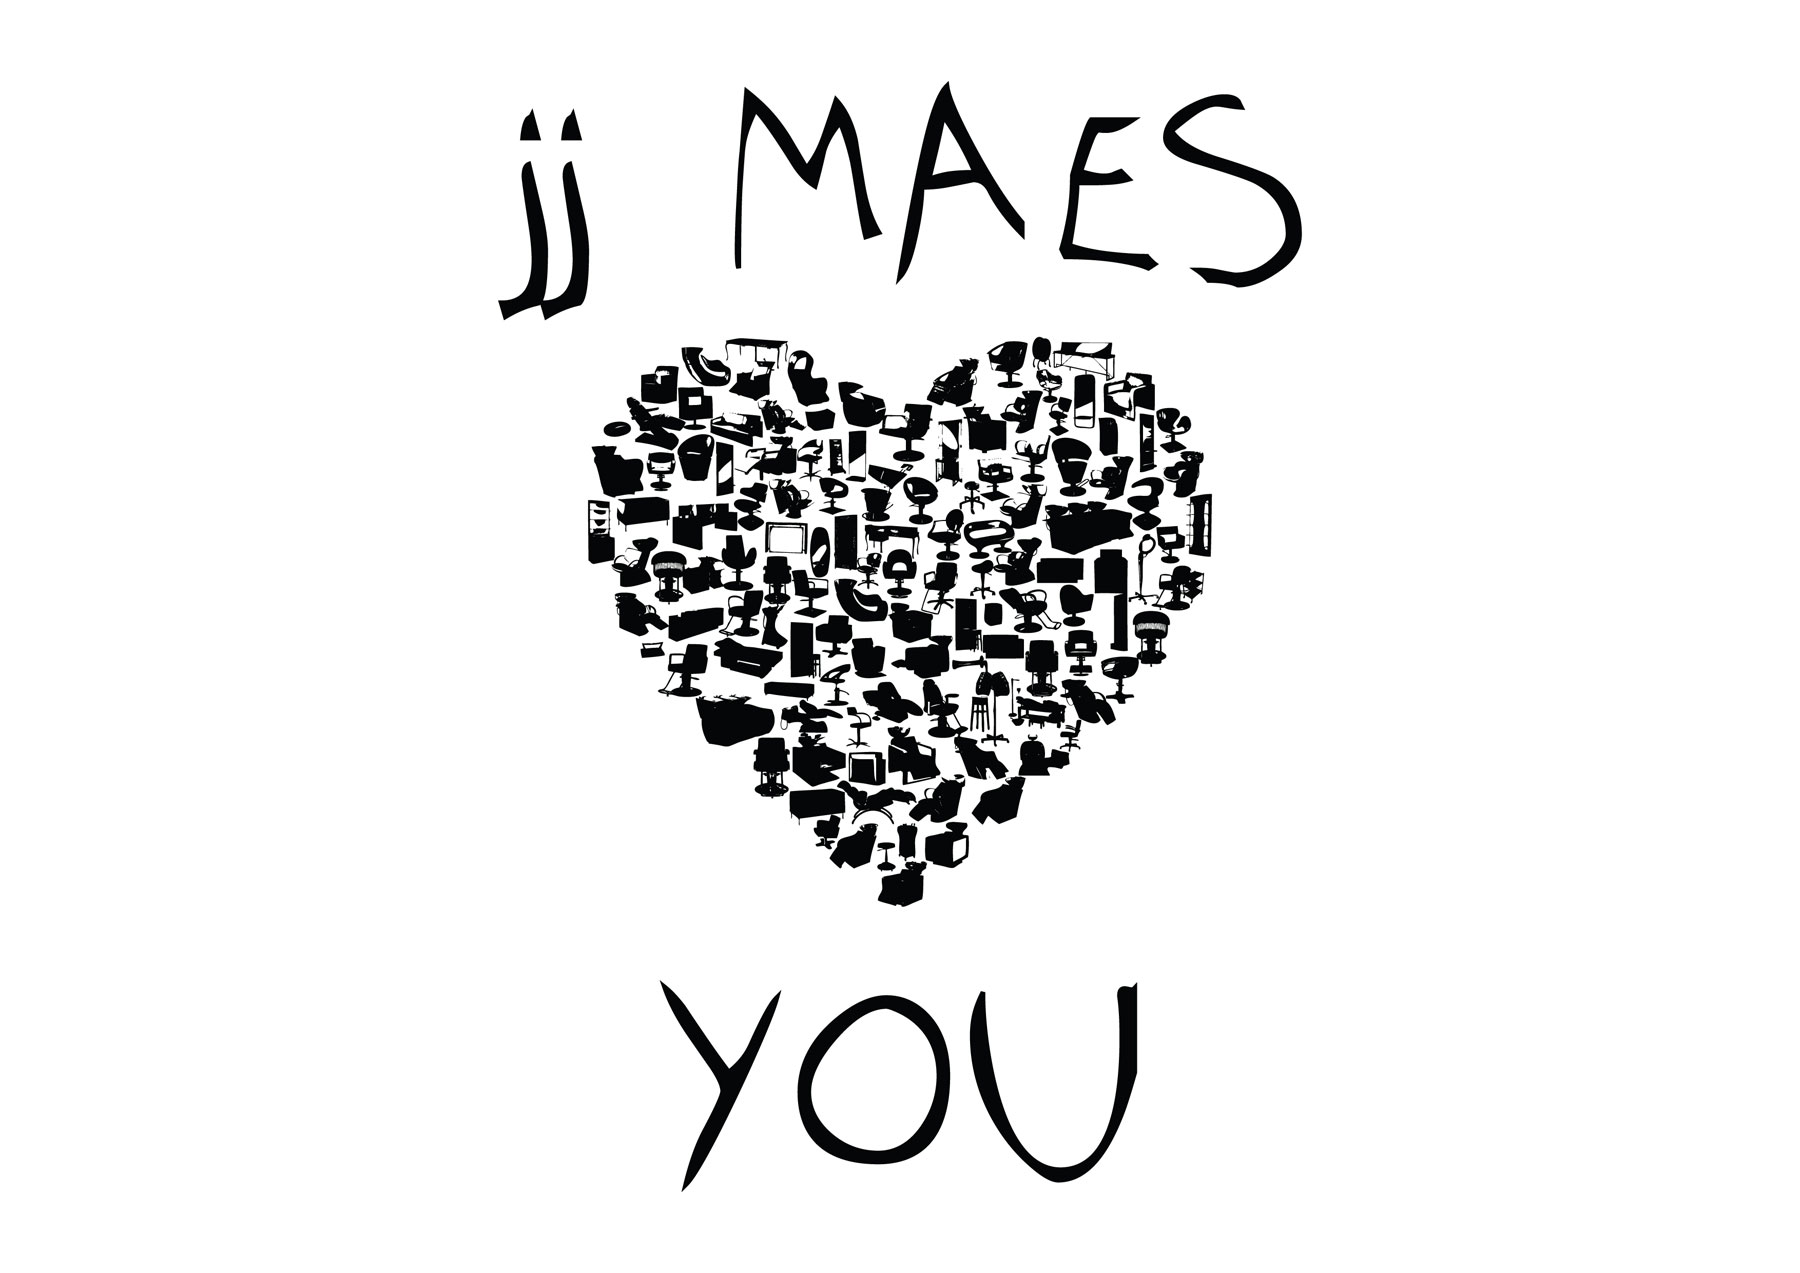 JJ Maes Campaign Visual